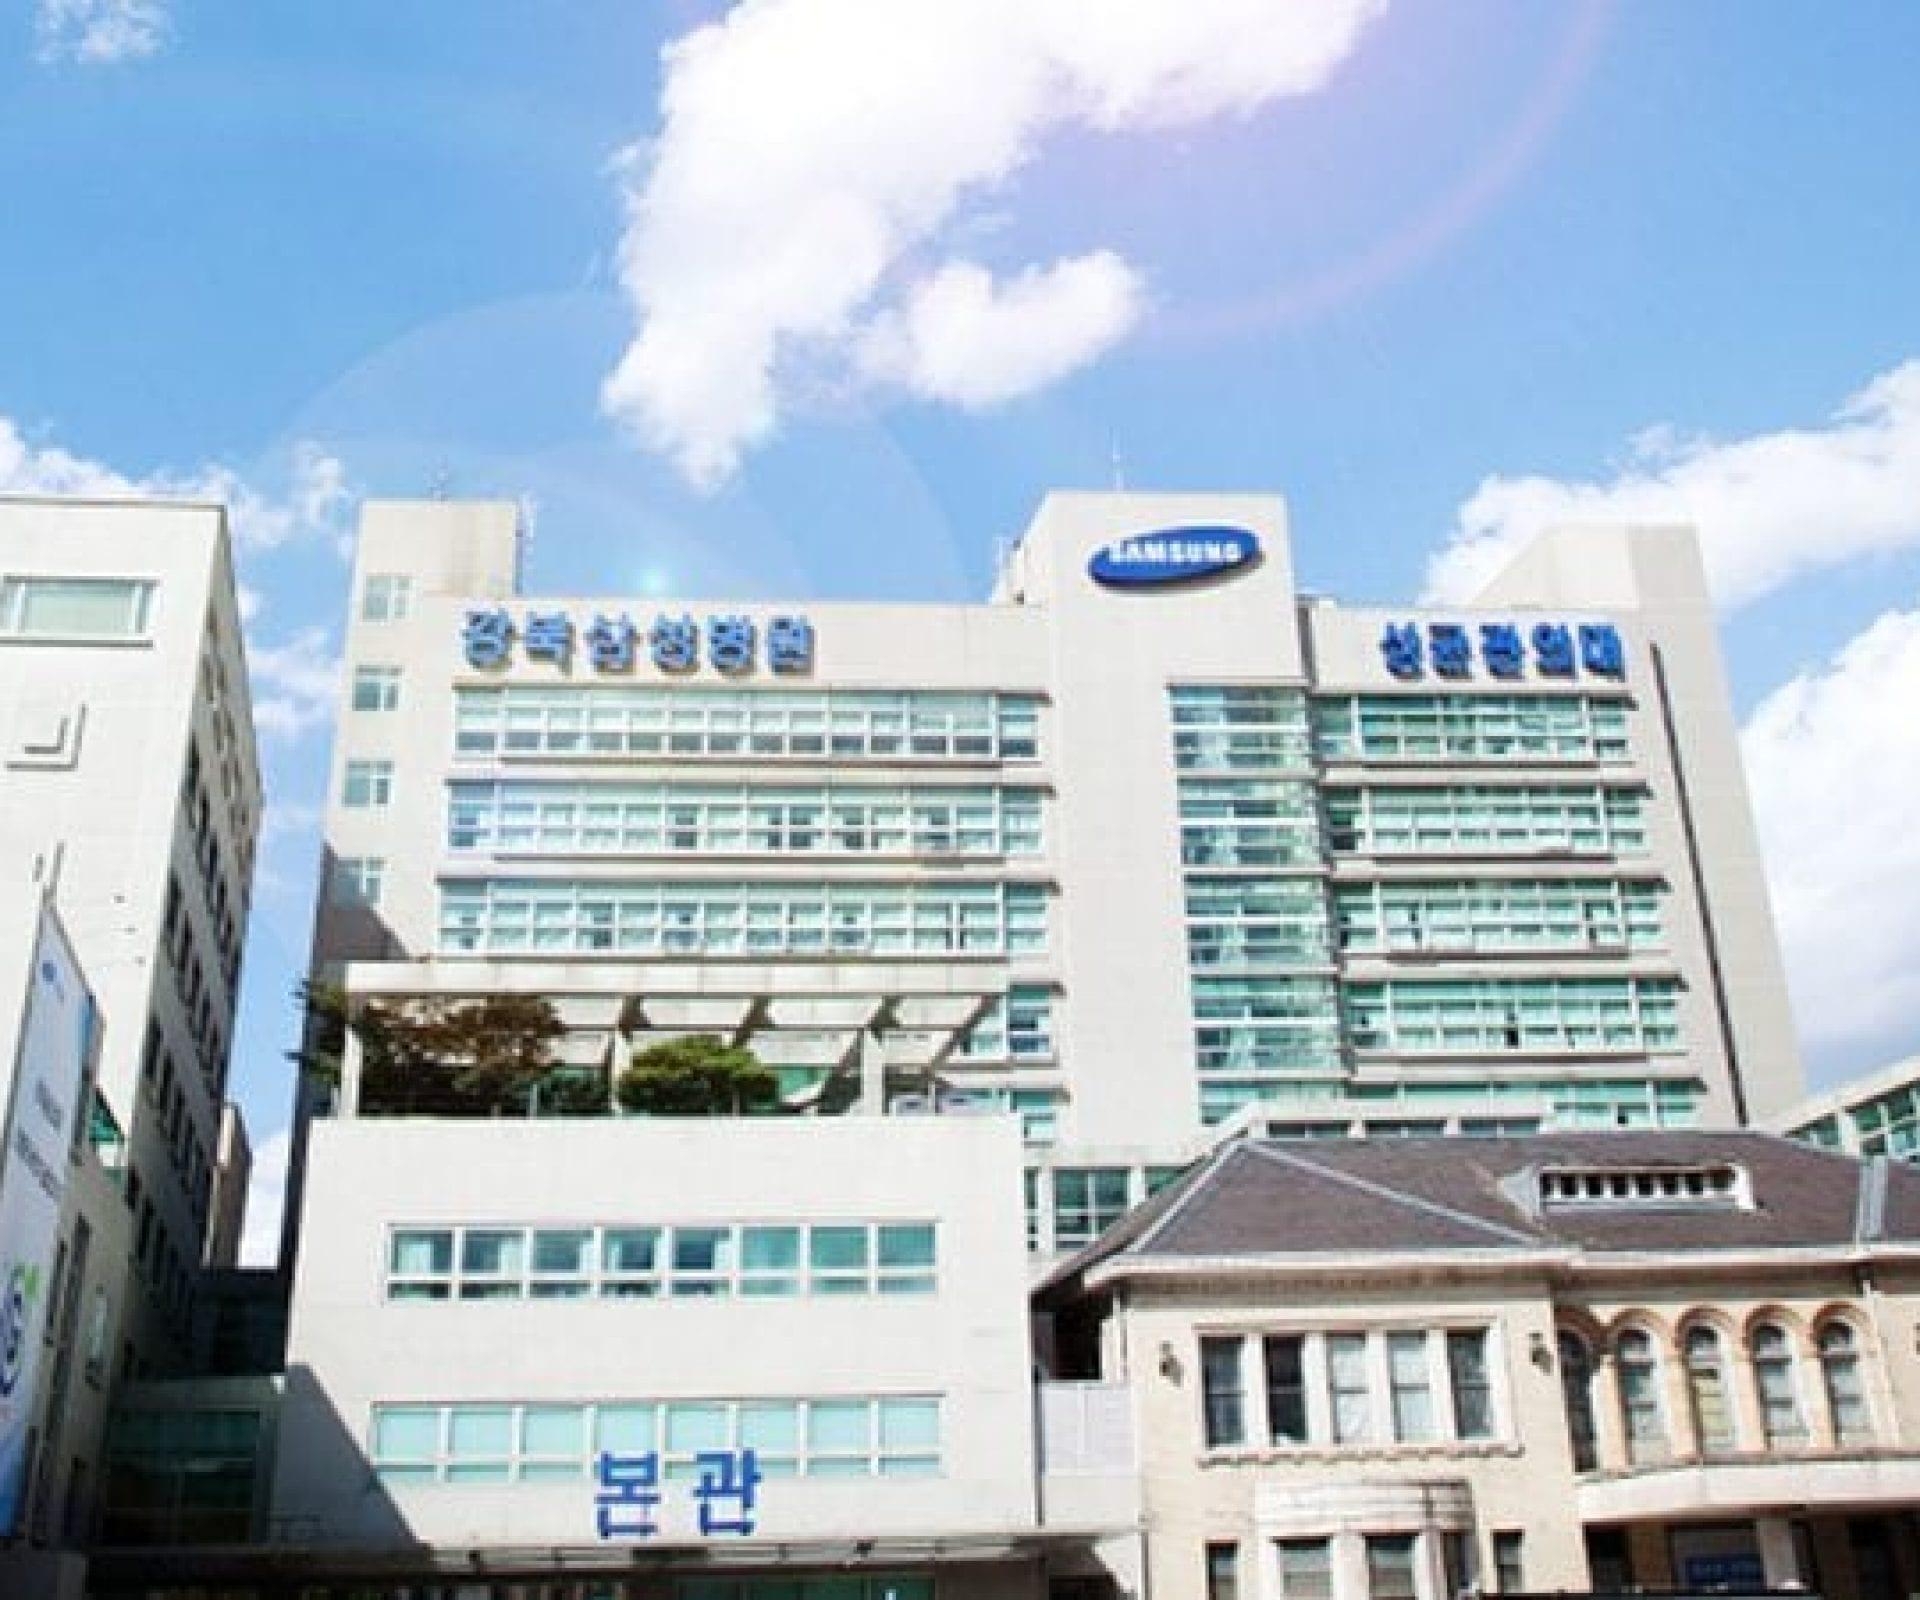 Kangbuk Samsung Hospital | Jongno-gu, Seoul